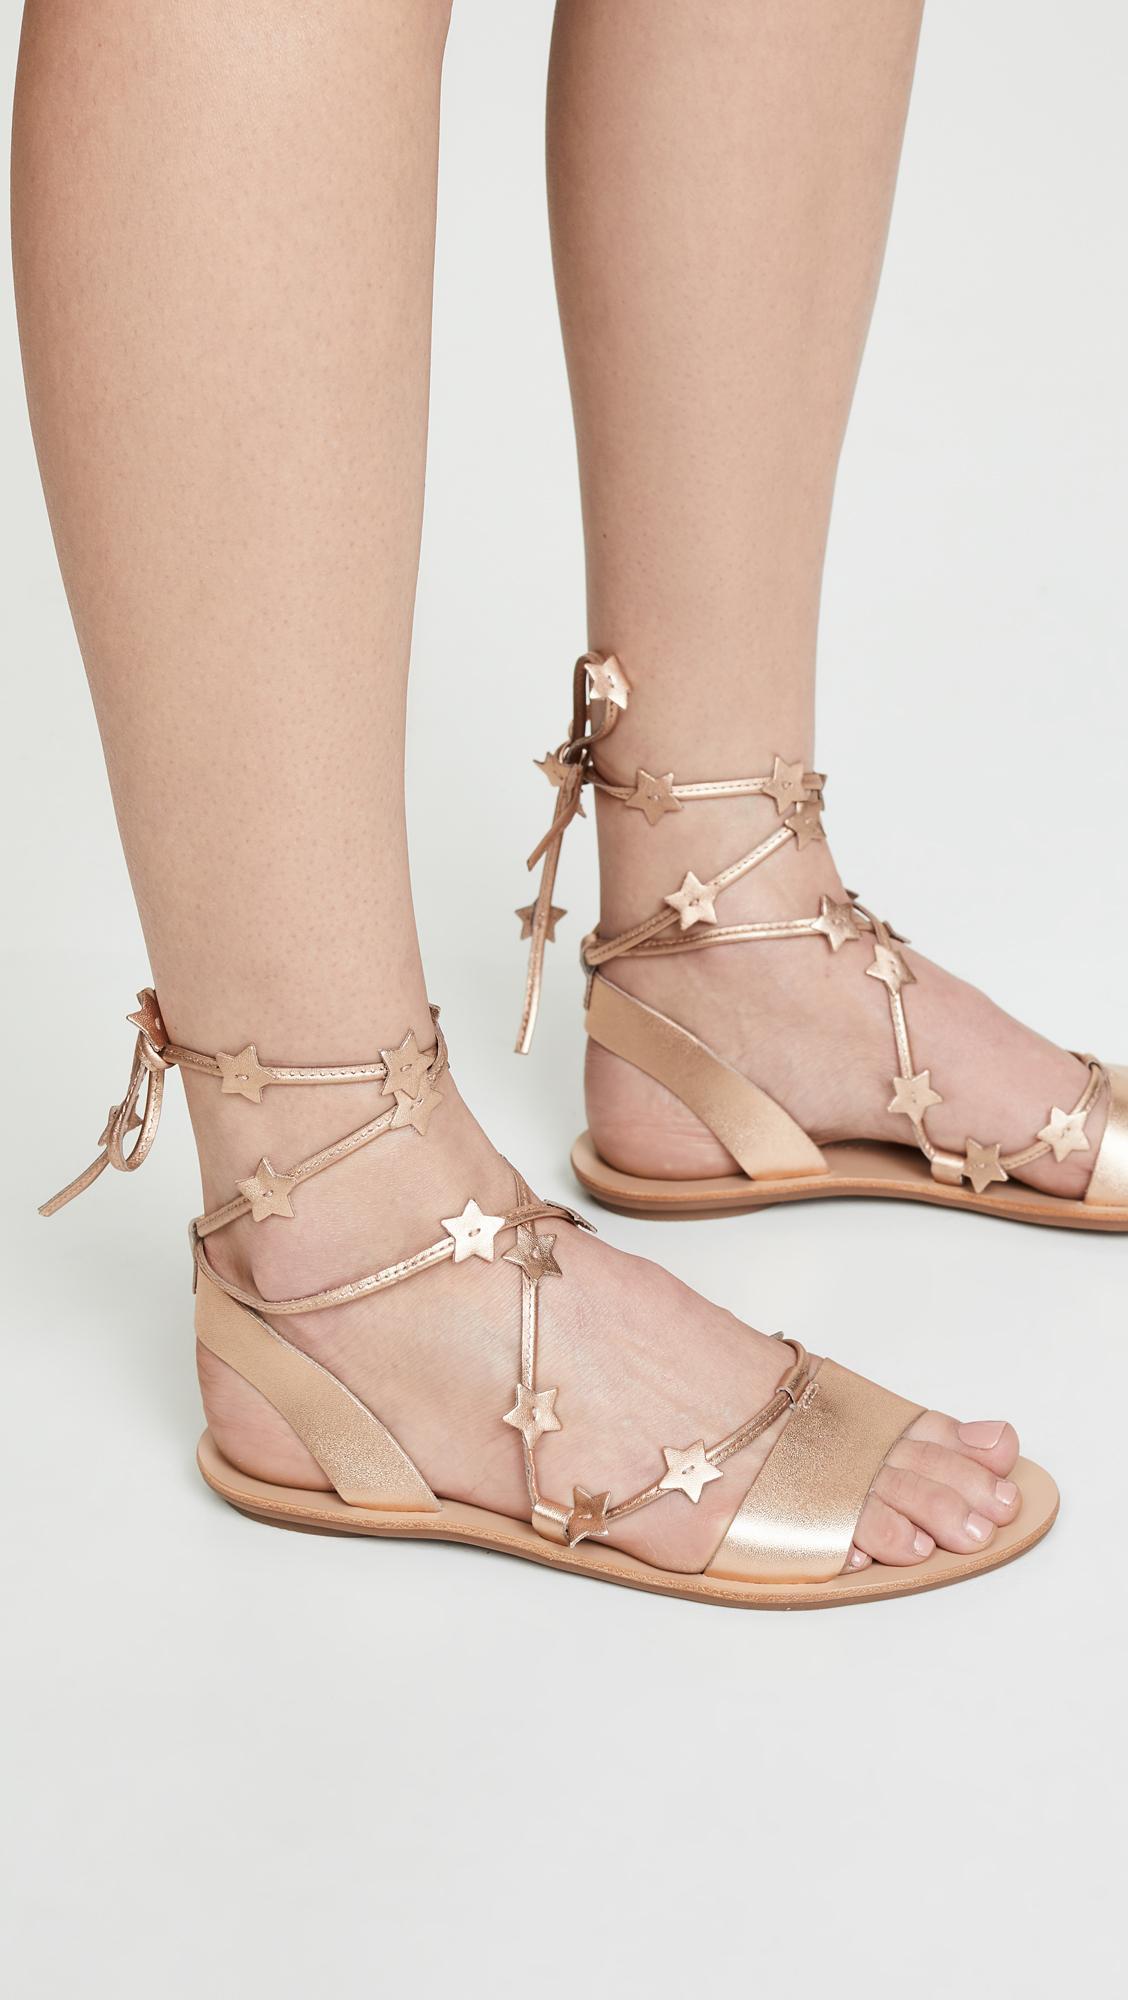 4f2770903088 Loeffler Randall - Multicolor Starla Ankle Wrap Sandals - Lyst. View  fullscreen